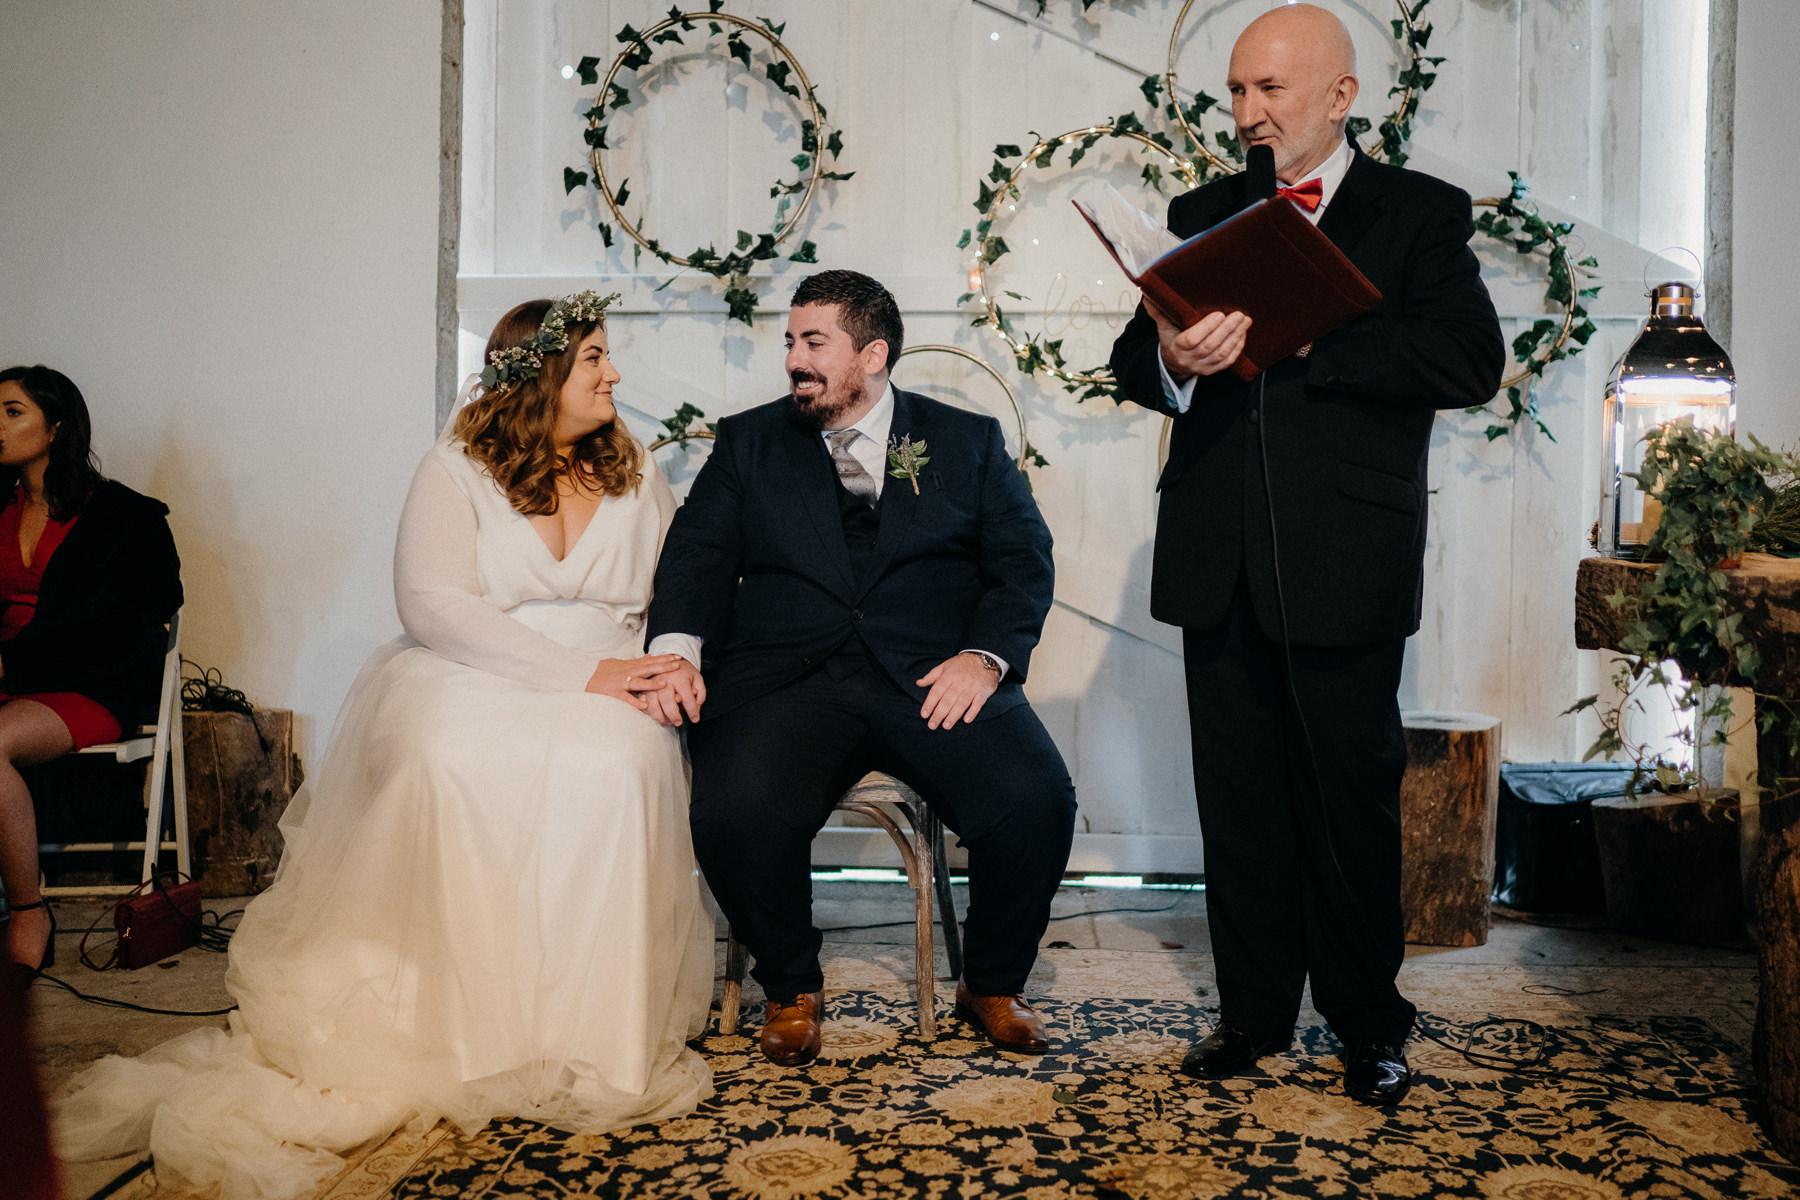 wedding-venue-tipperary-ireland-cloughjordan-house